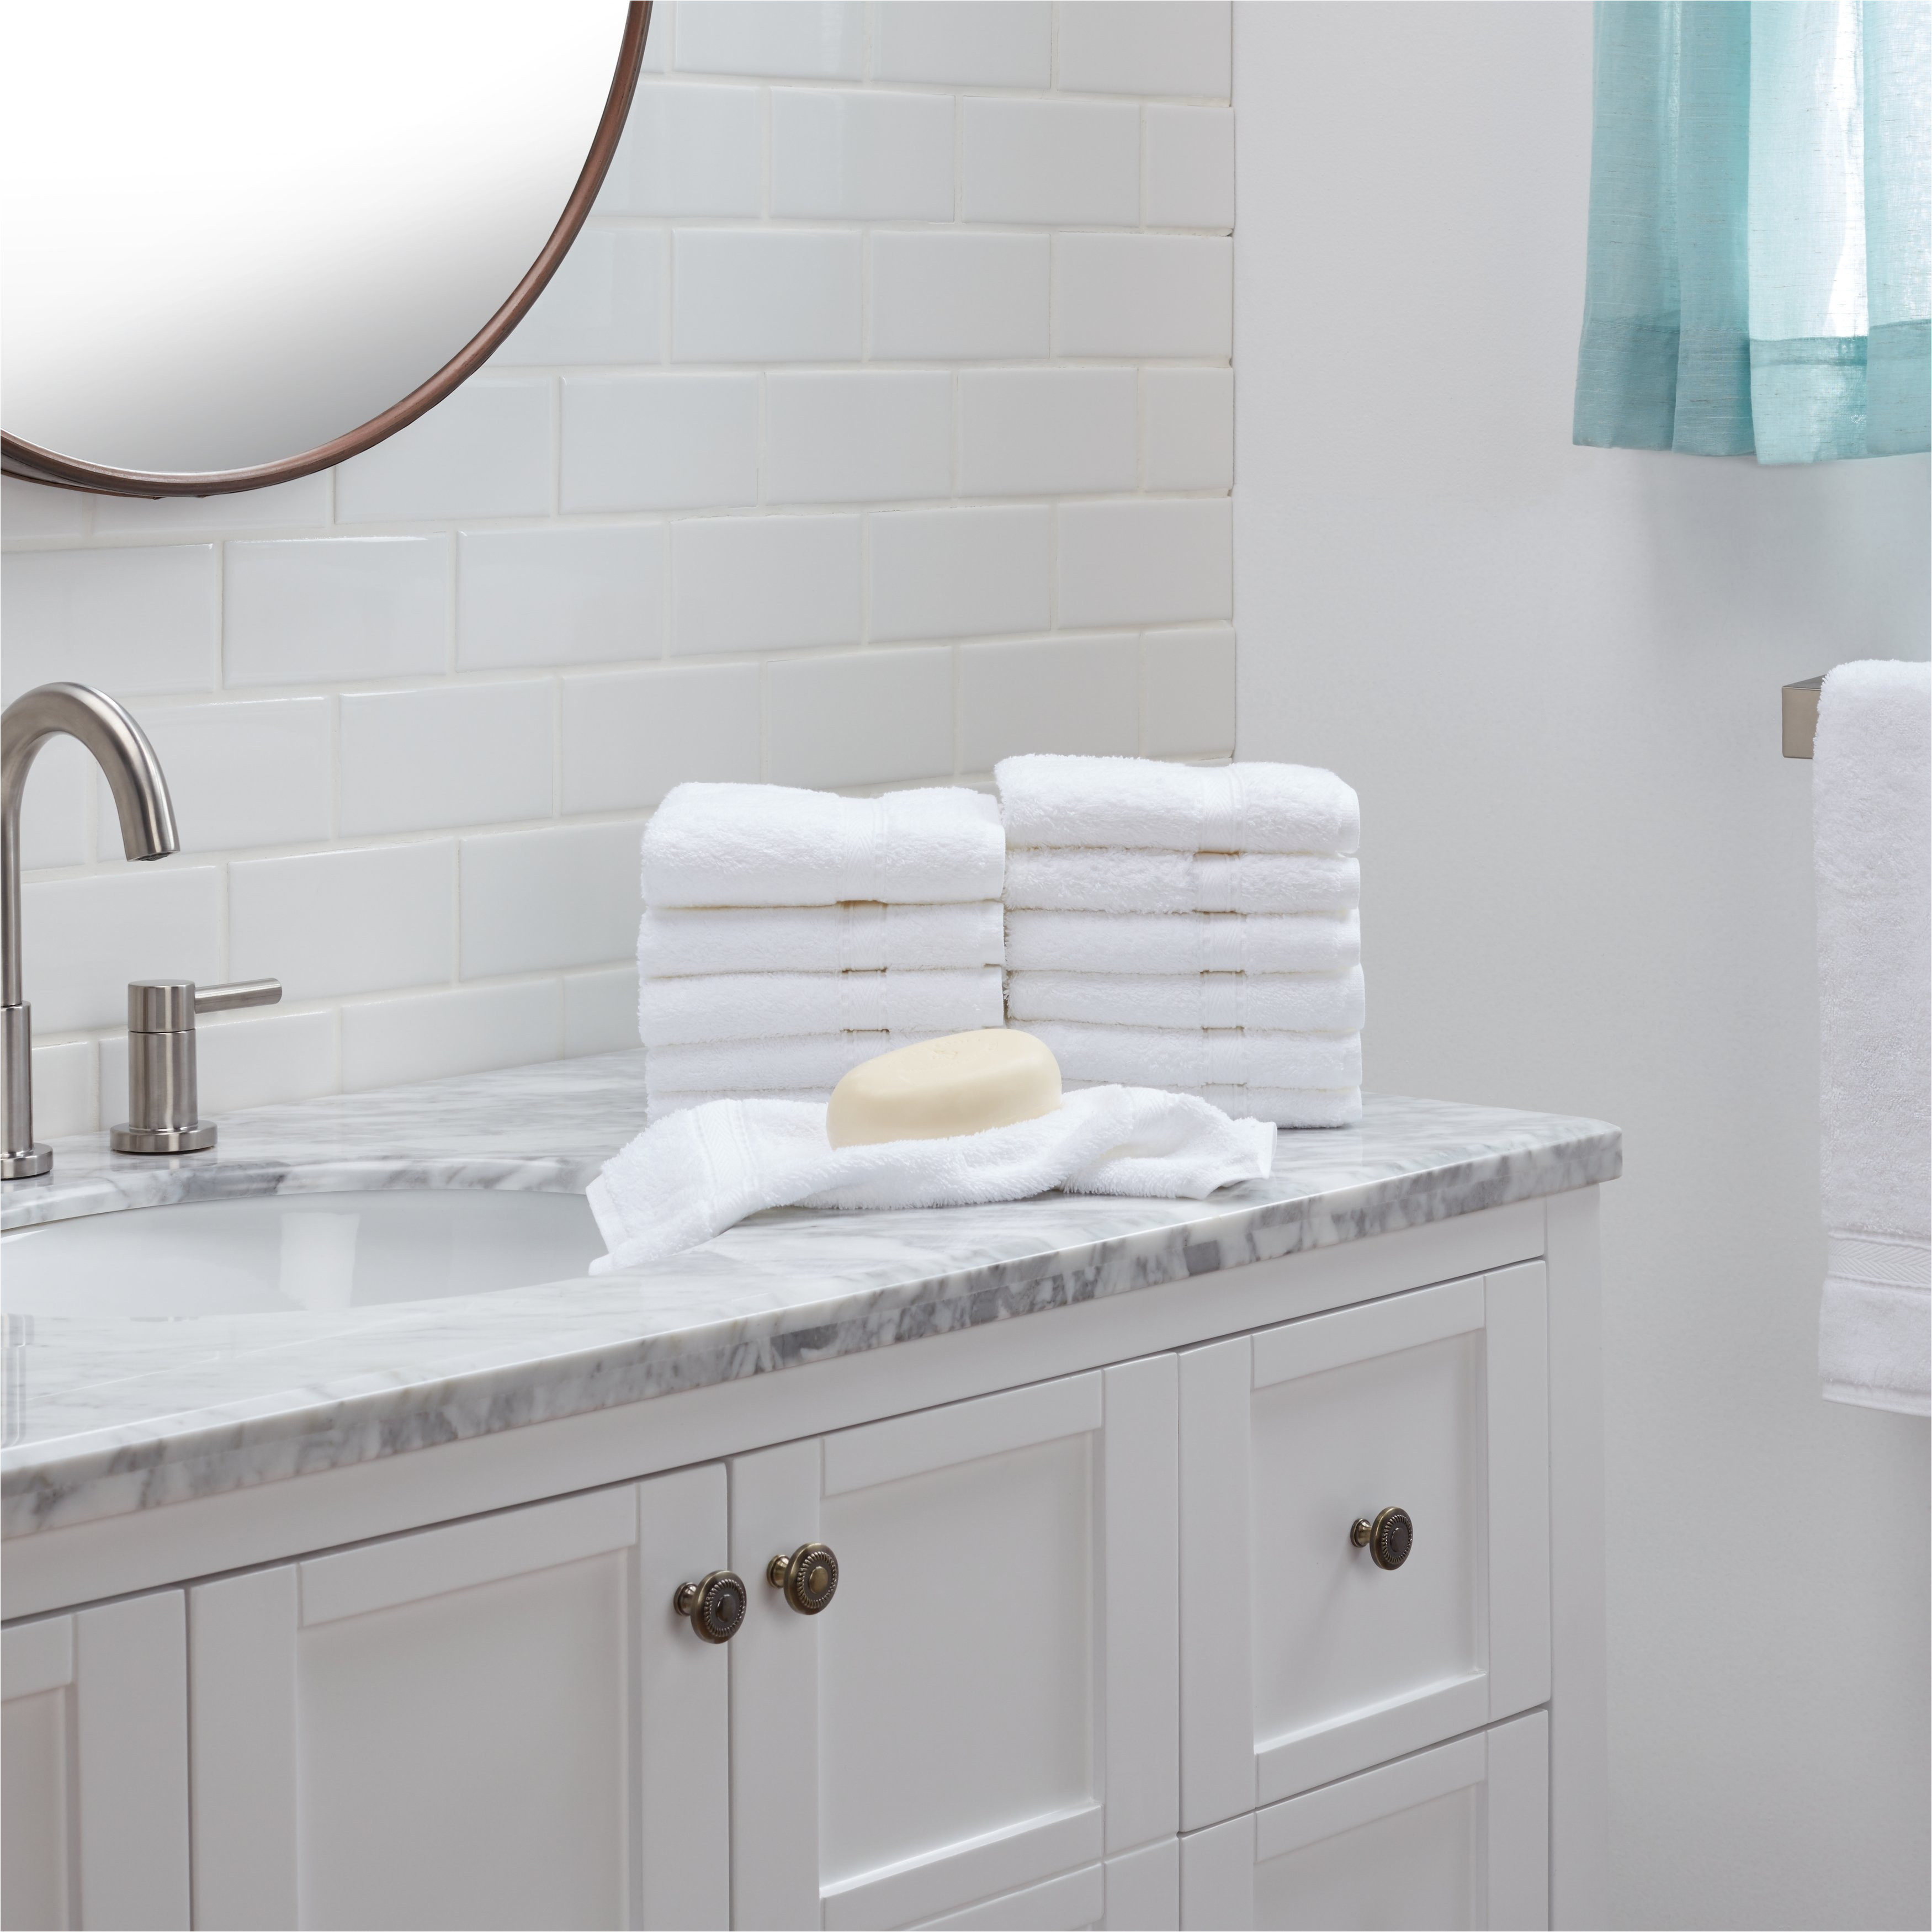 bath towels shop our best bedding bath deals online at overstock com